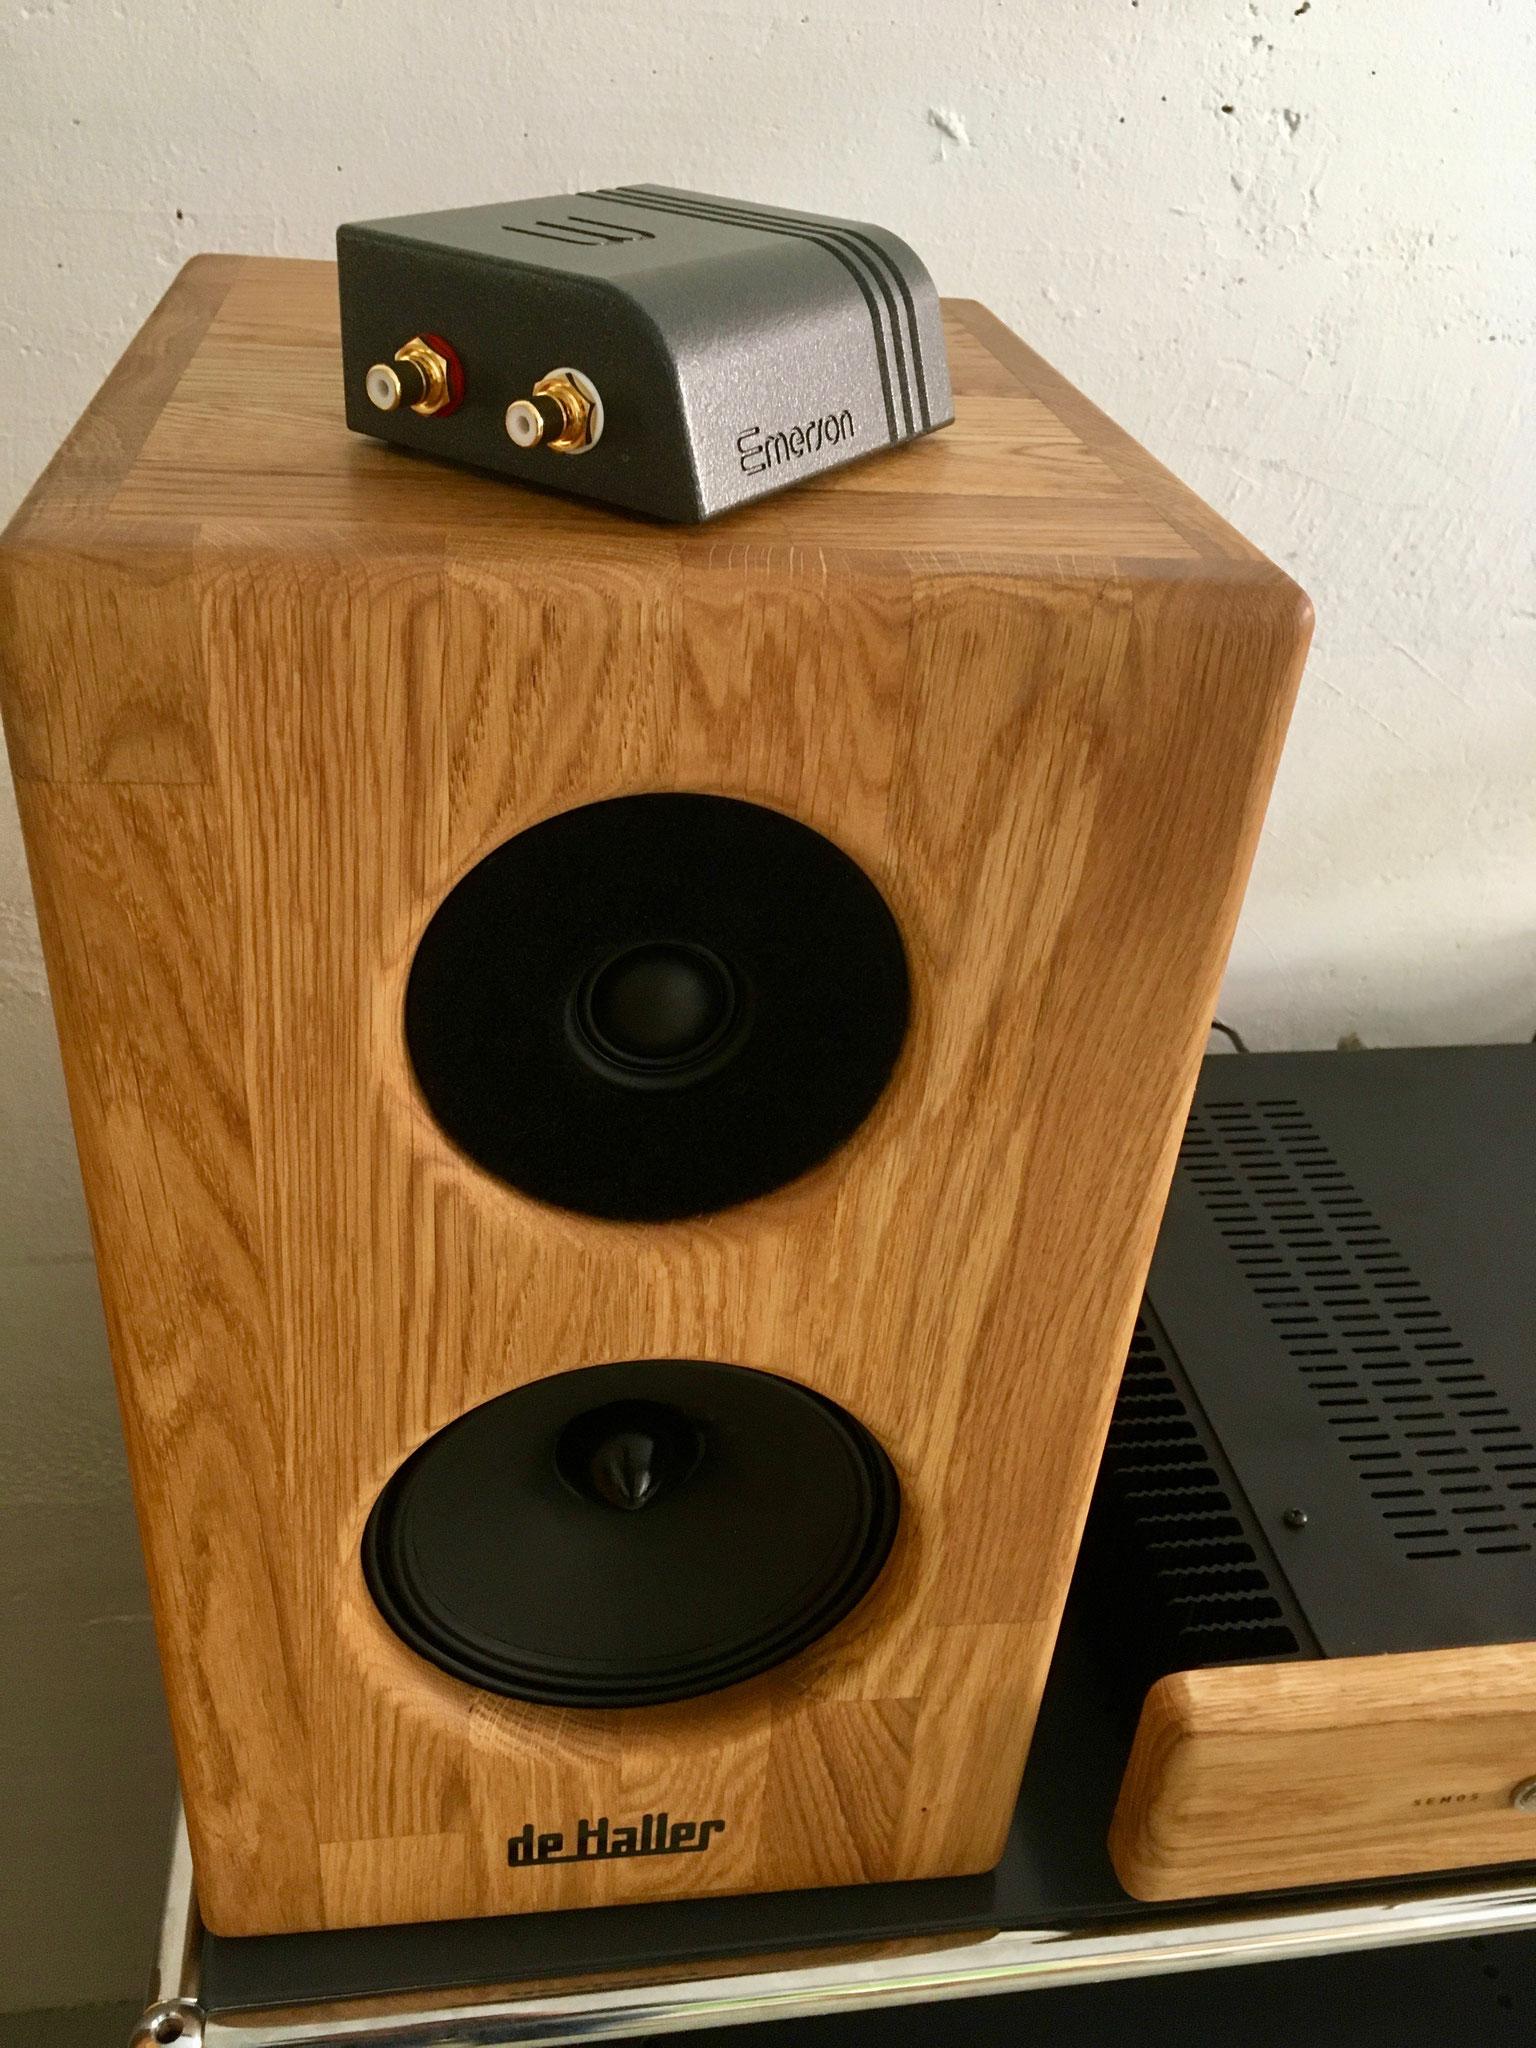 Streamer audio Wattson Audio Emerson Analog - Enceinte acoustique De Haller Dina 6, amplificateur Semos